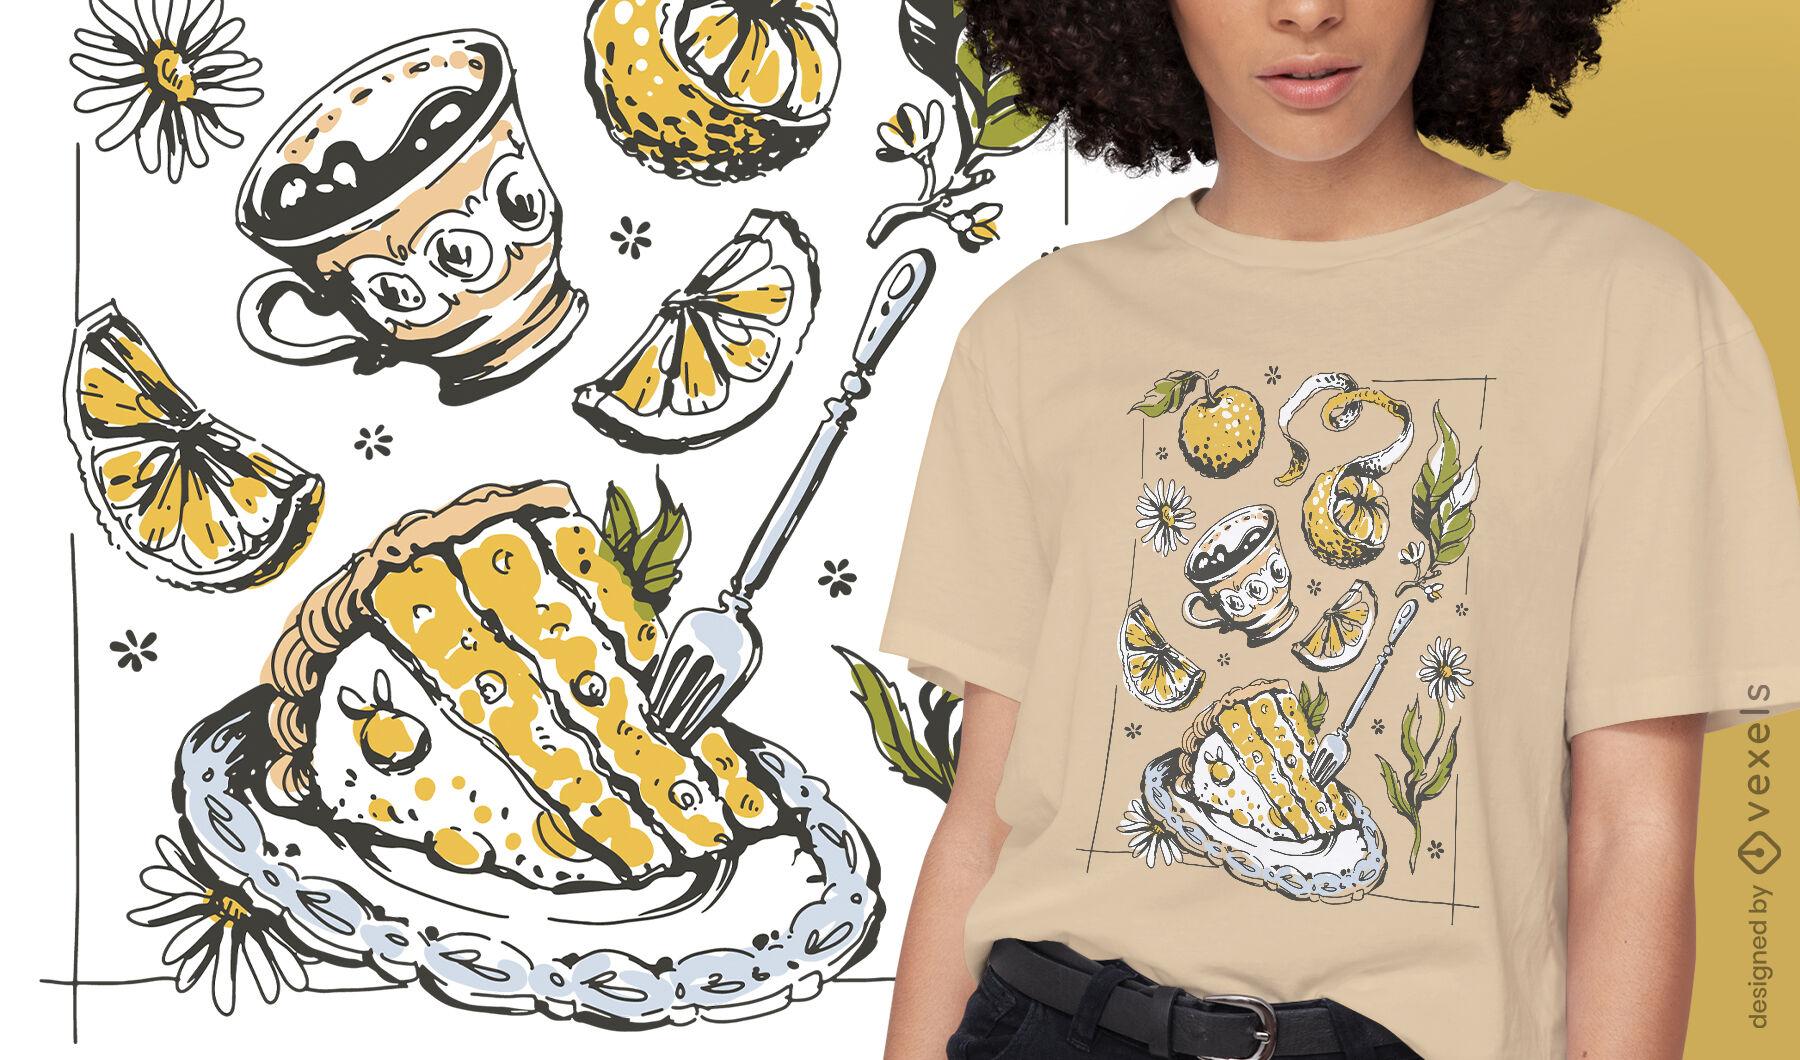 Cottagecore lifestyle food t-shirt design